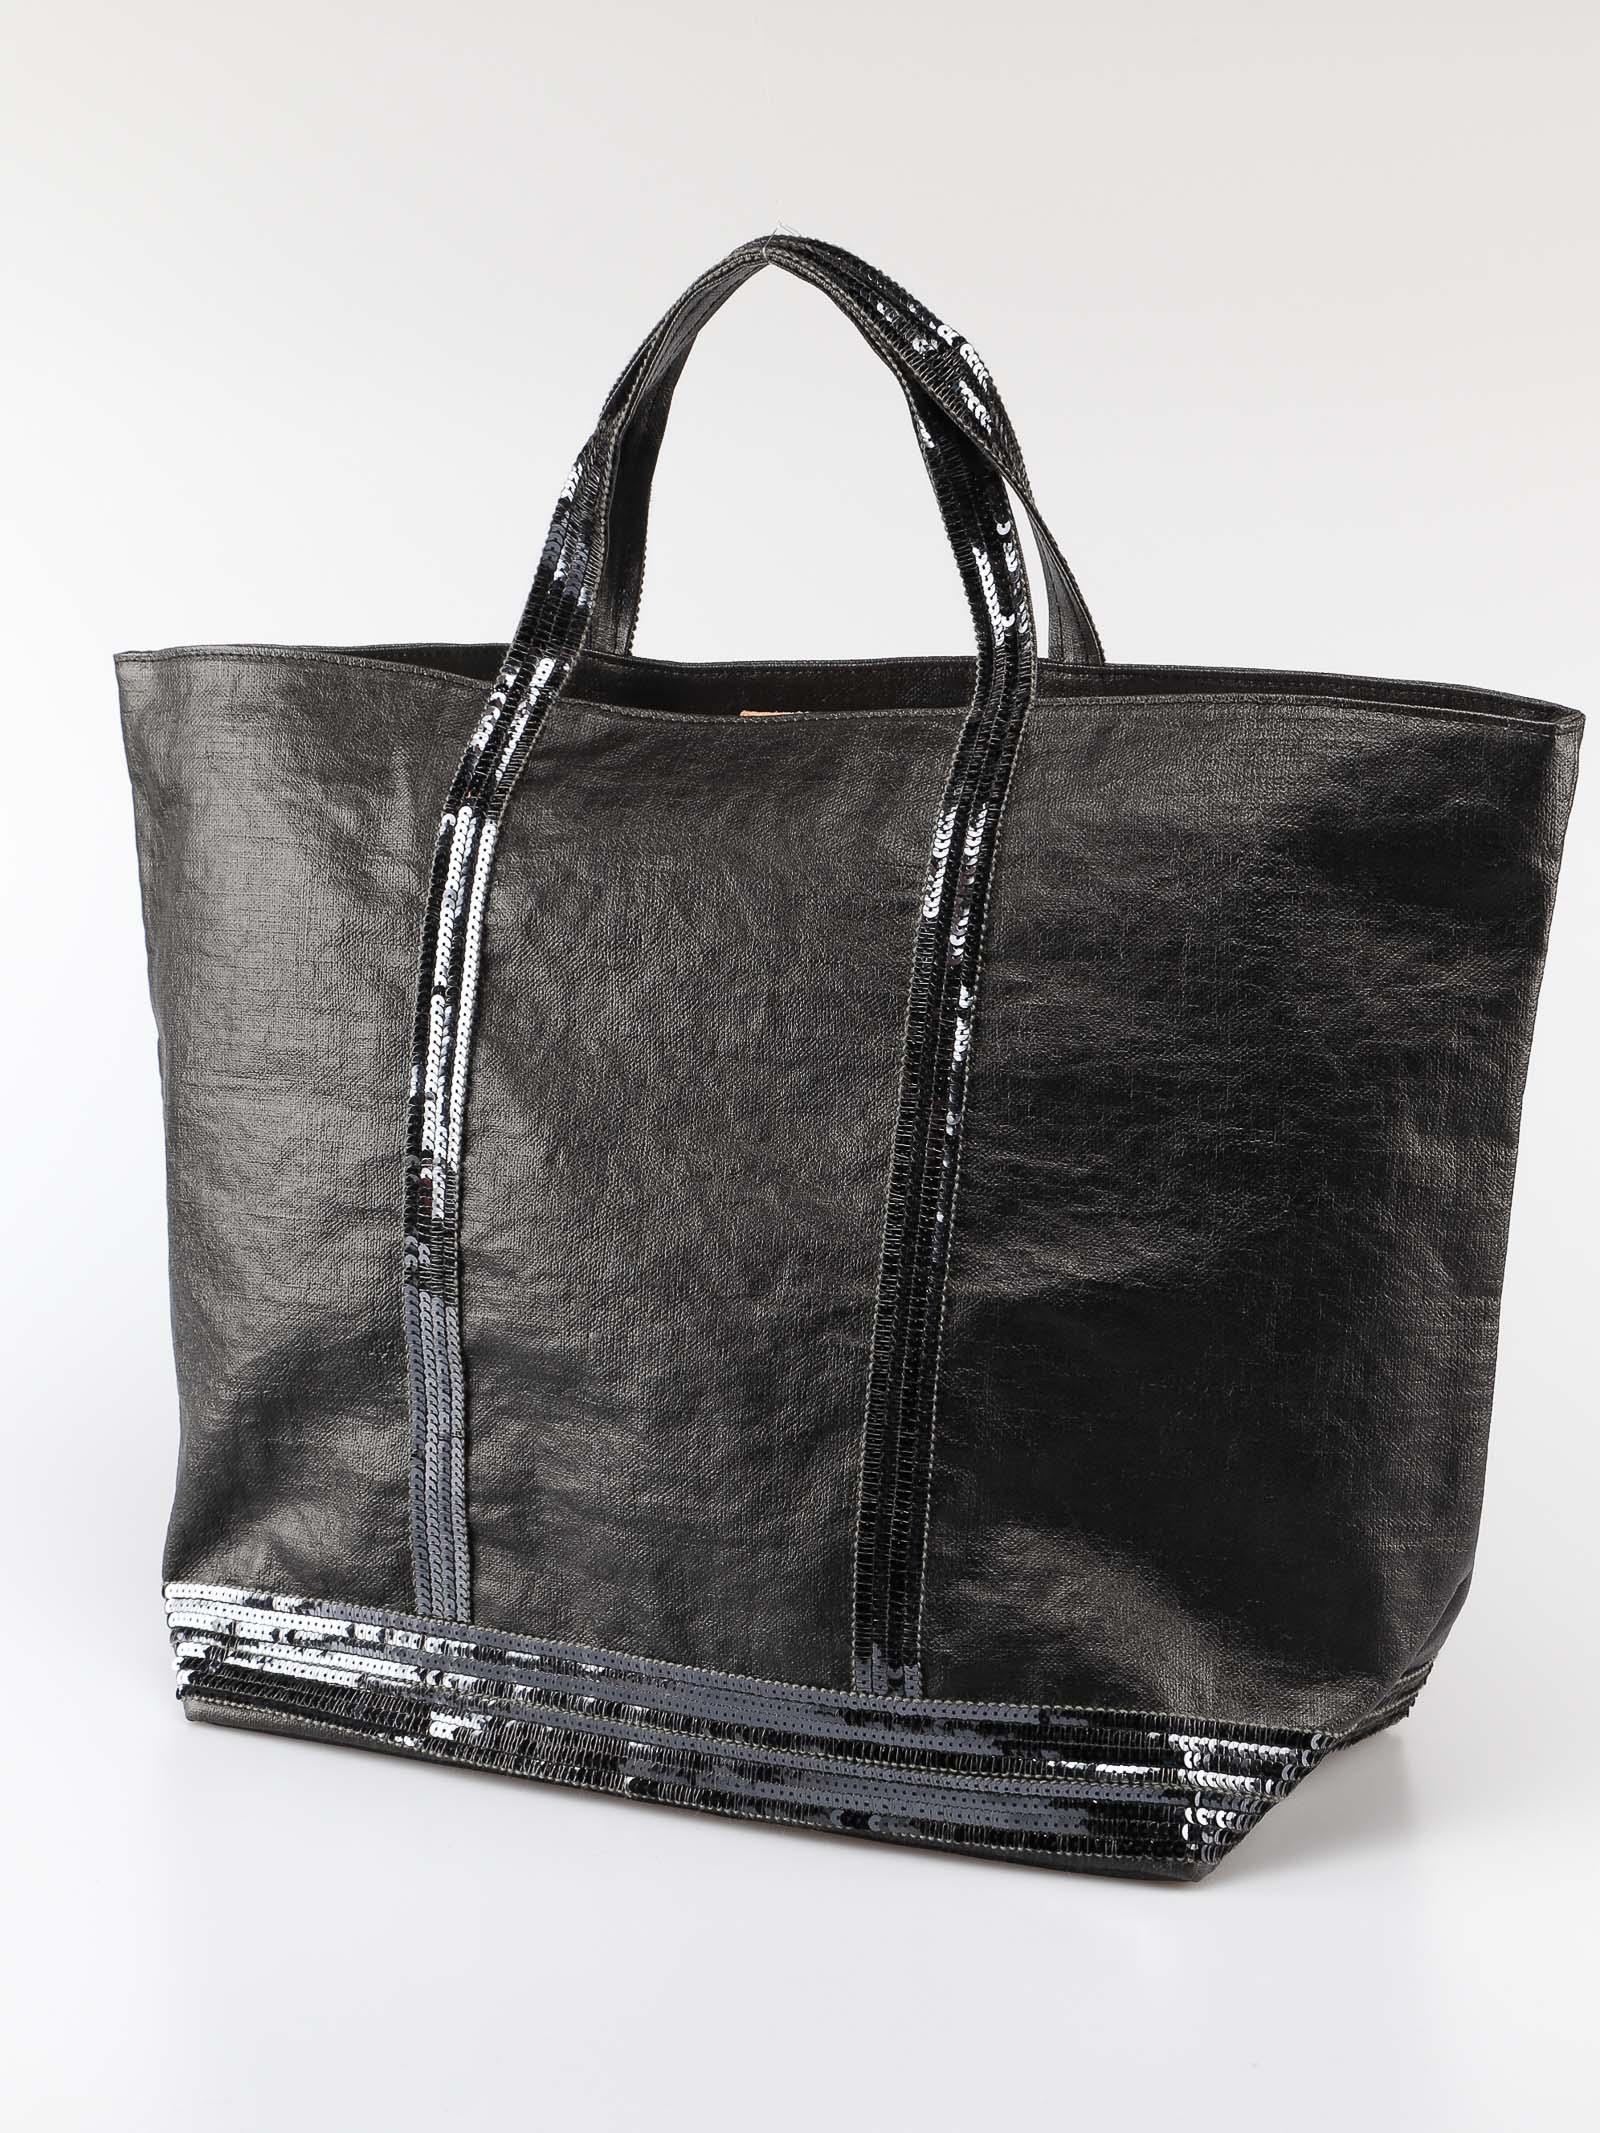 ef30ed72f4b Vanessa Bruno Vanessa Bruno Sequin Embellished Tote - Noir ...